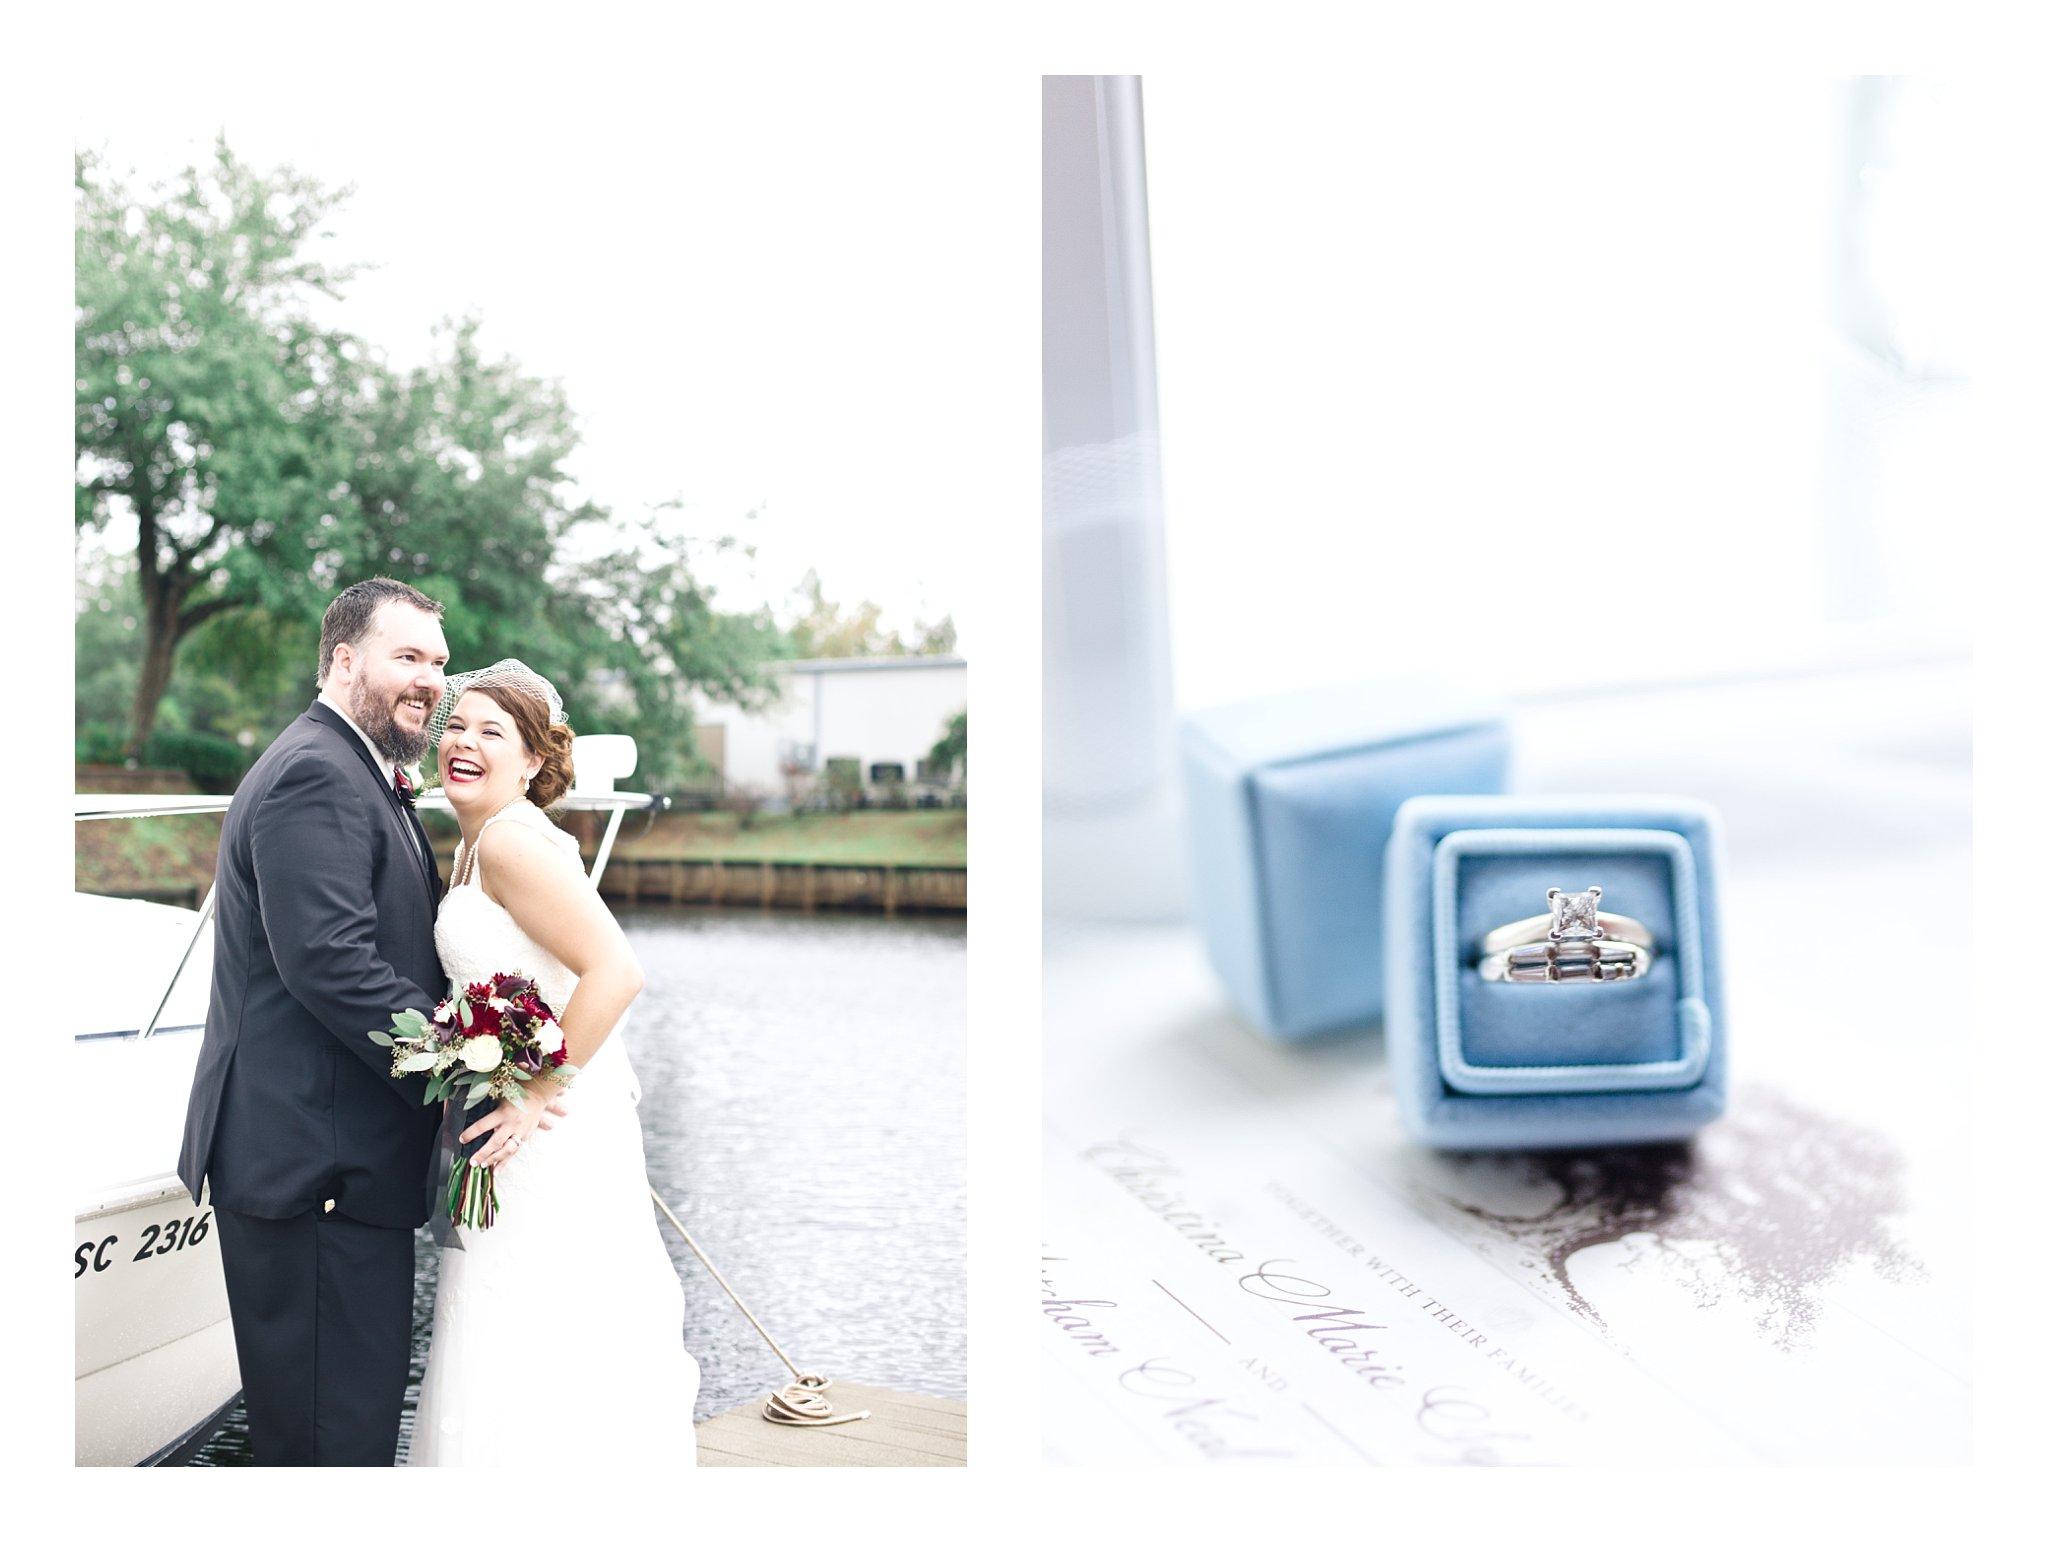 cypress-inn-garnet-black-lowcountry-vintage-wedding-conway-sc-photos_0152.jpg